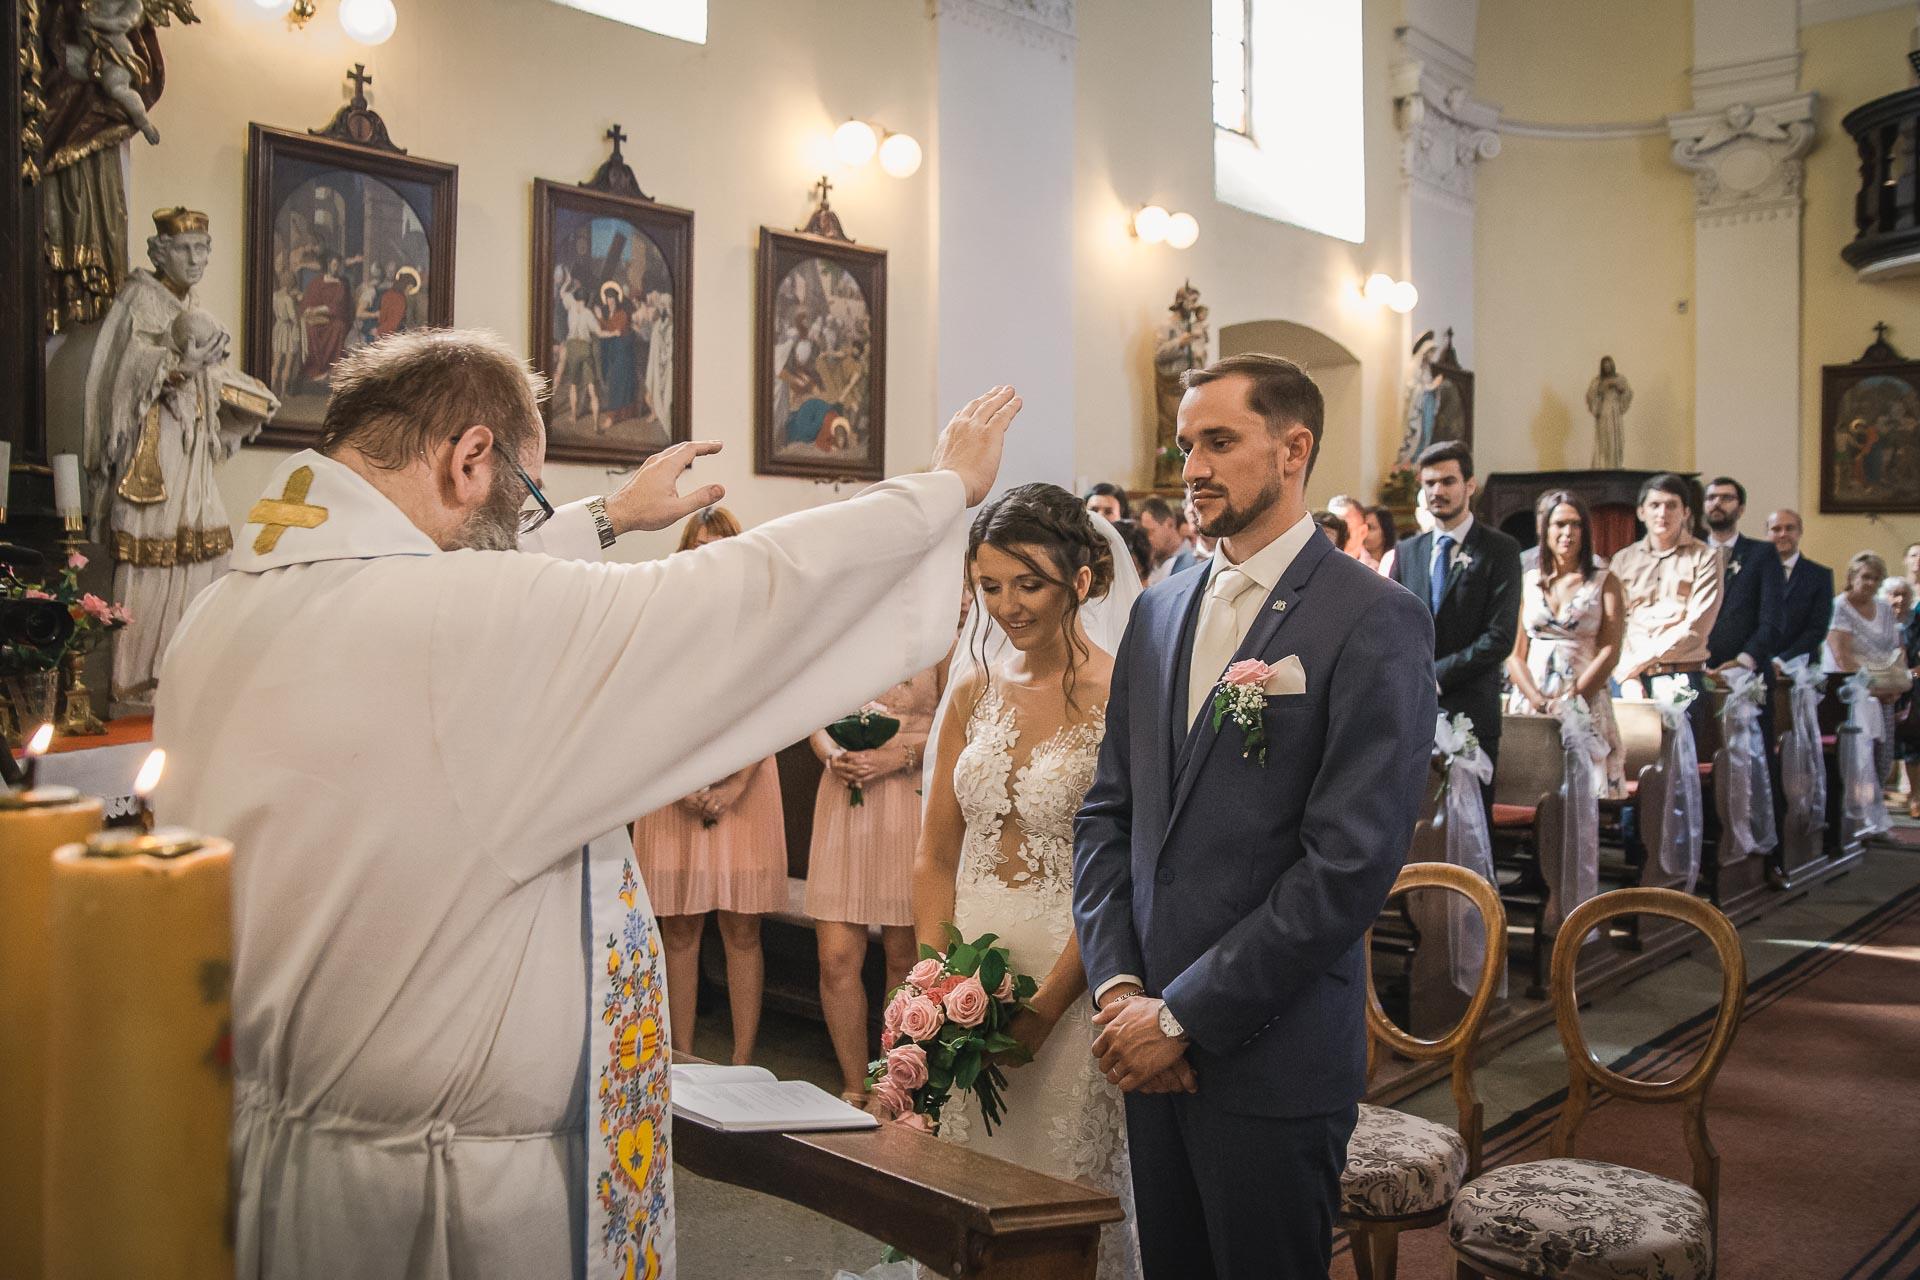 svatební-fotograf-wedding-svatebni-video-orlík-vltava-kostel-statek-stodola-boho-svatba-Beautyfoto-259